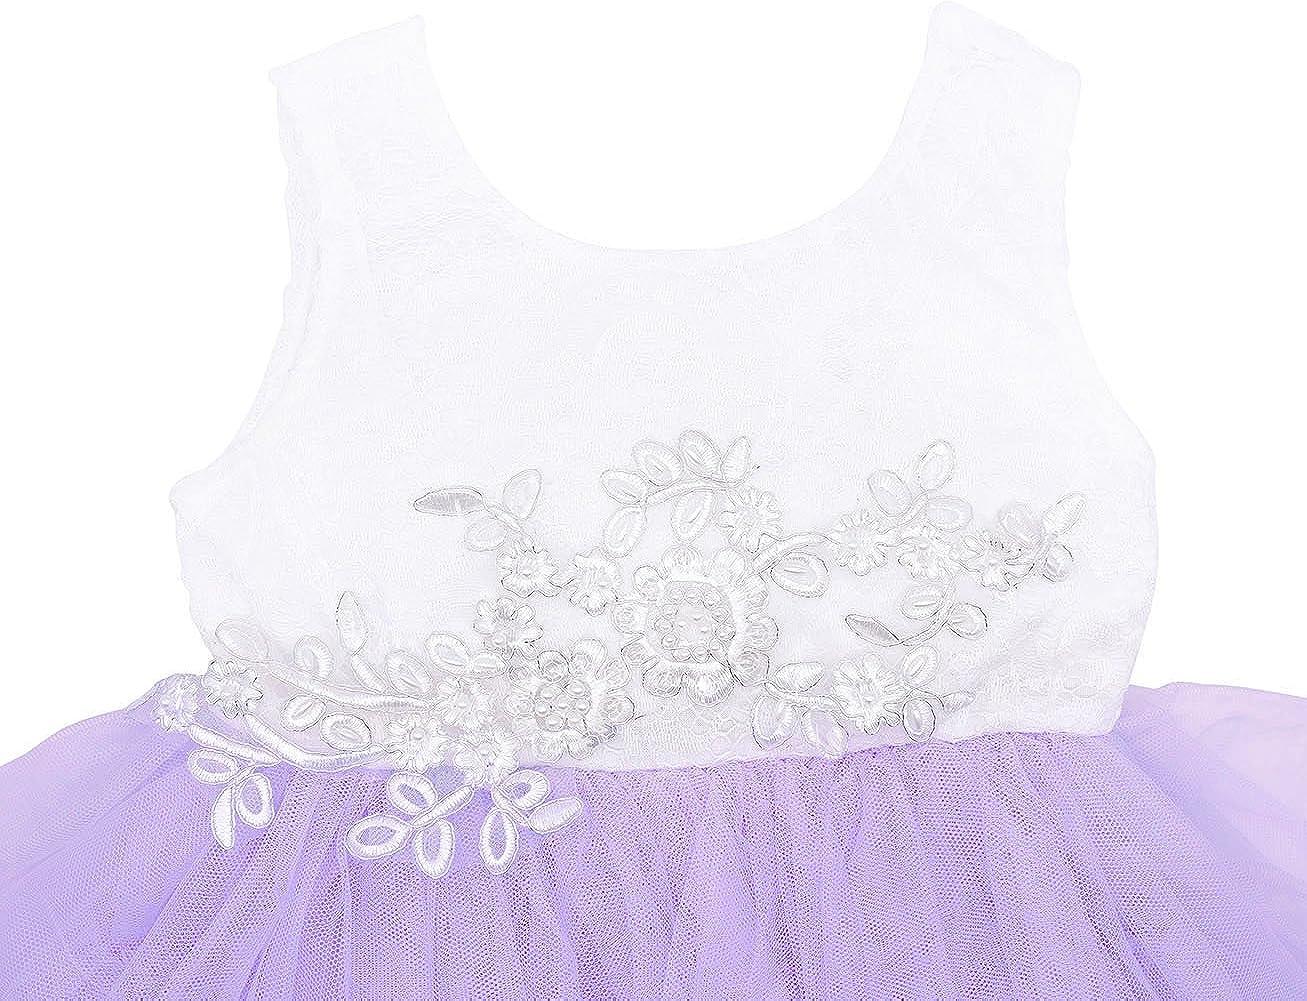 AmzBarley Girls Tutu Dress Child Kids Sleeveless//Long Sleeve Lace Tulle Flower Party Dresses Wedding Birthday Evening Pageant Christening Outfit